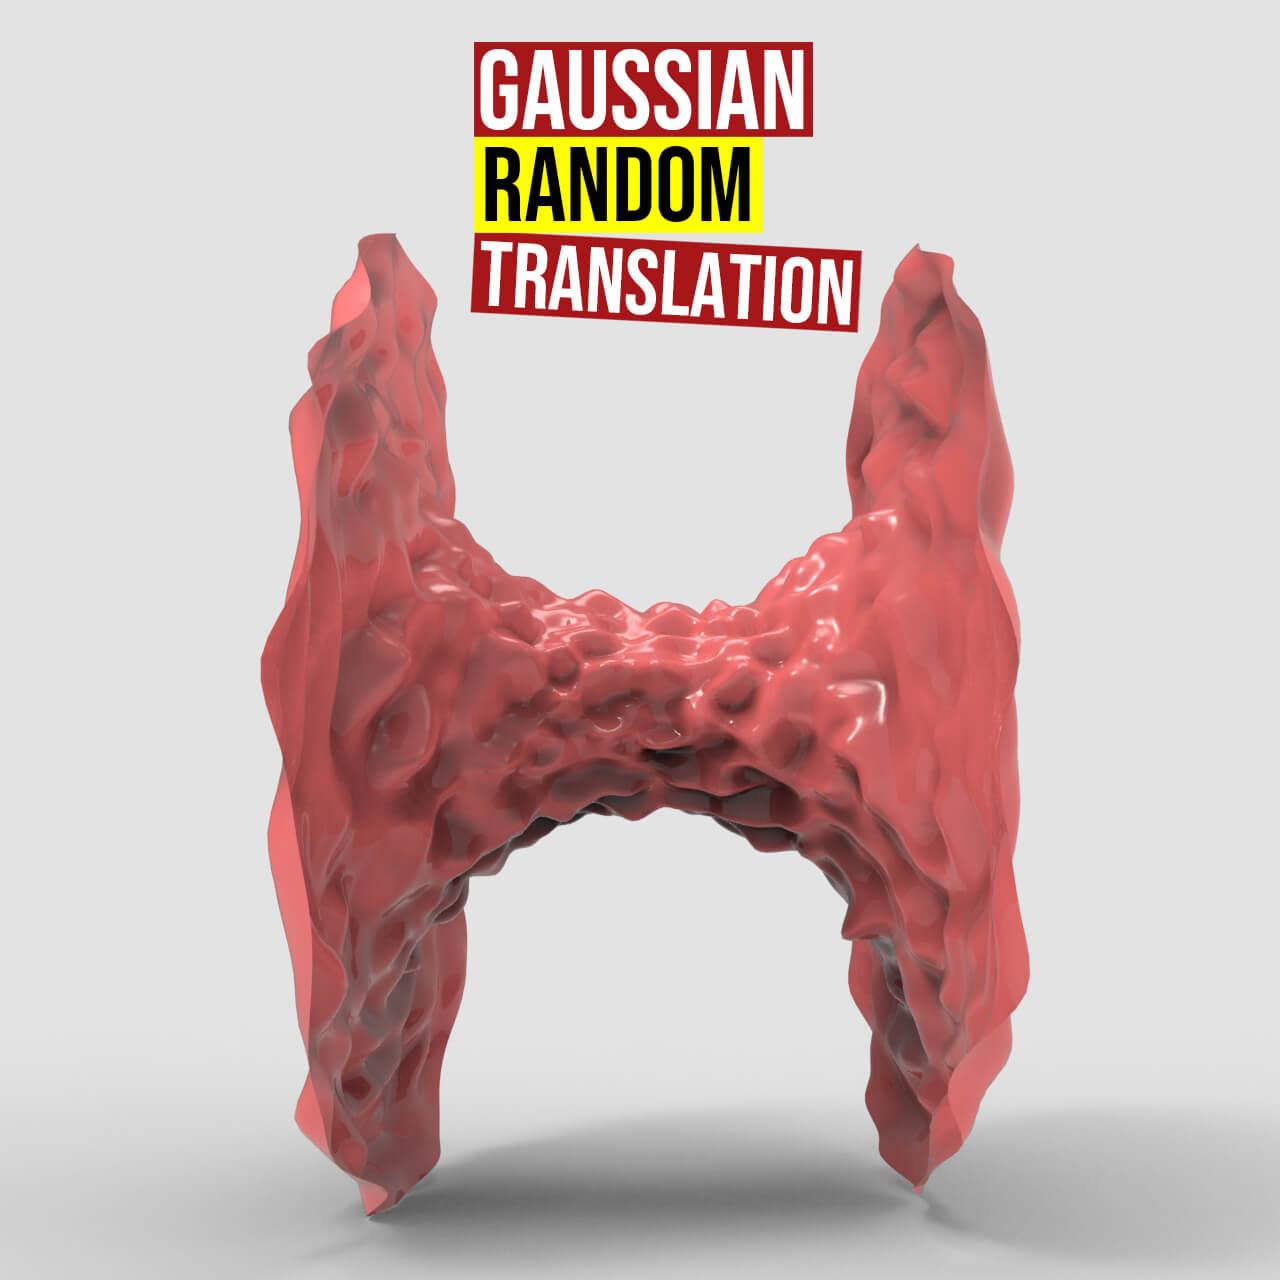 Gaussian Random Translation